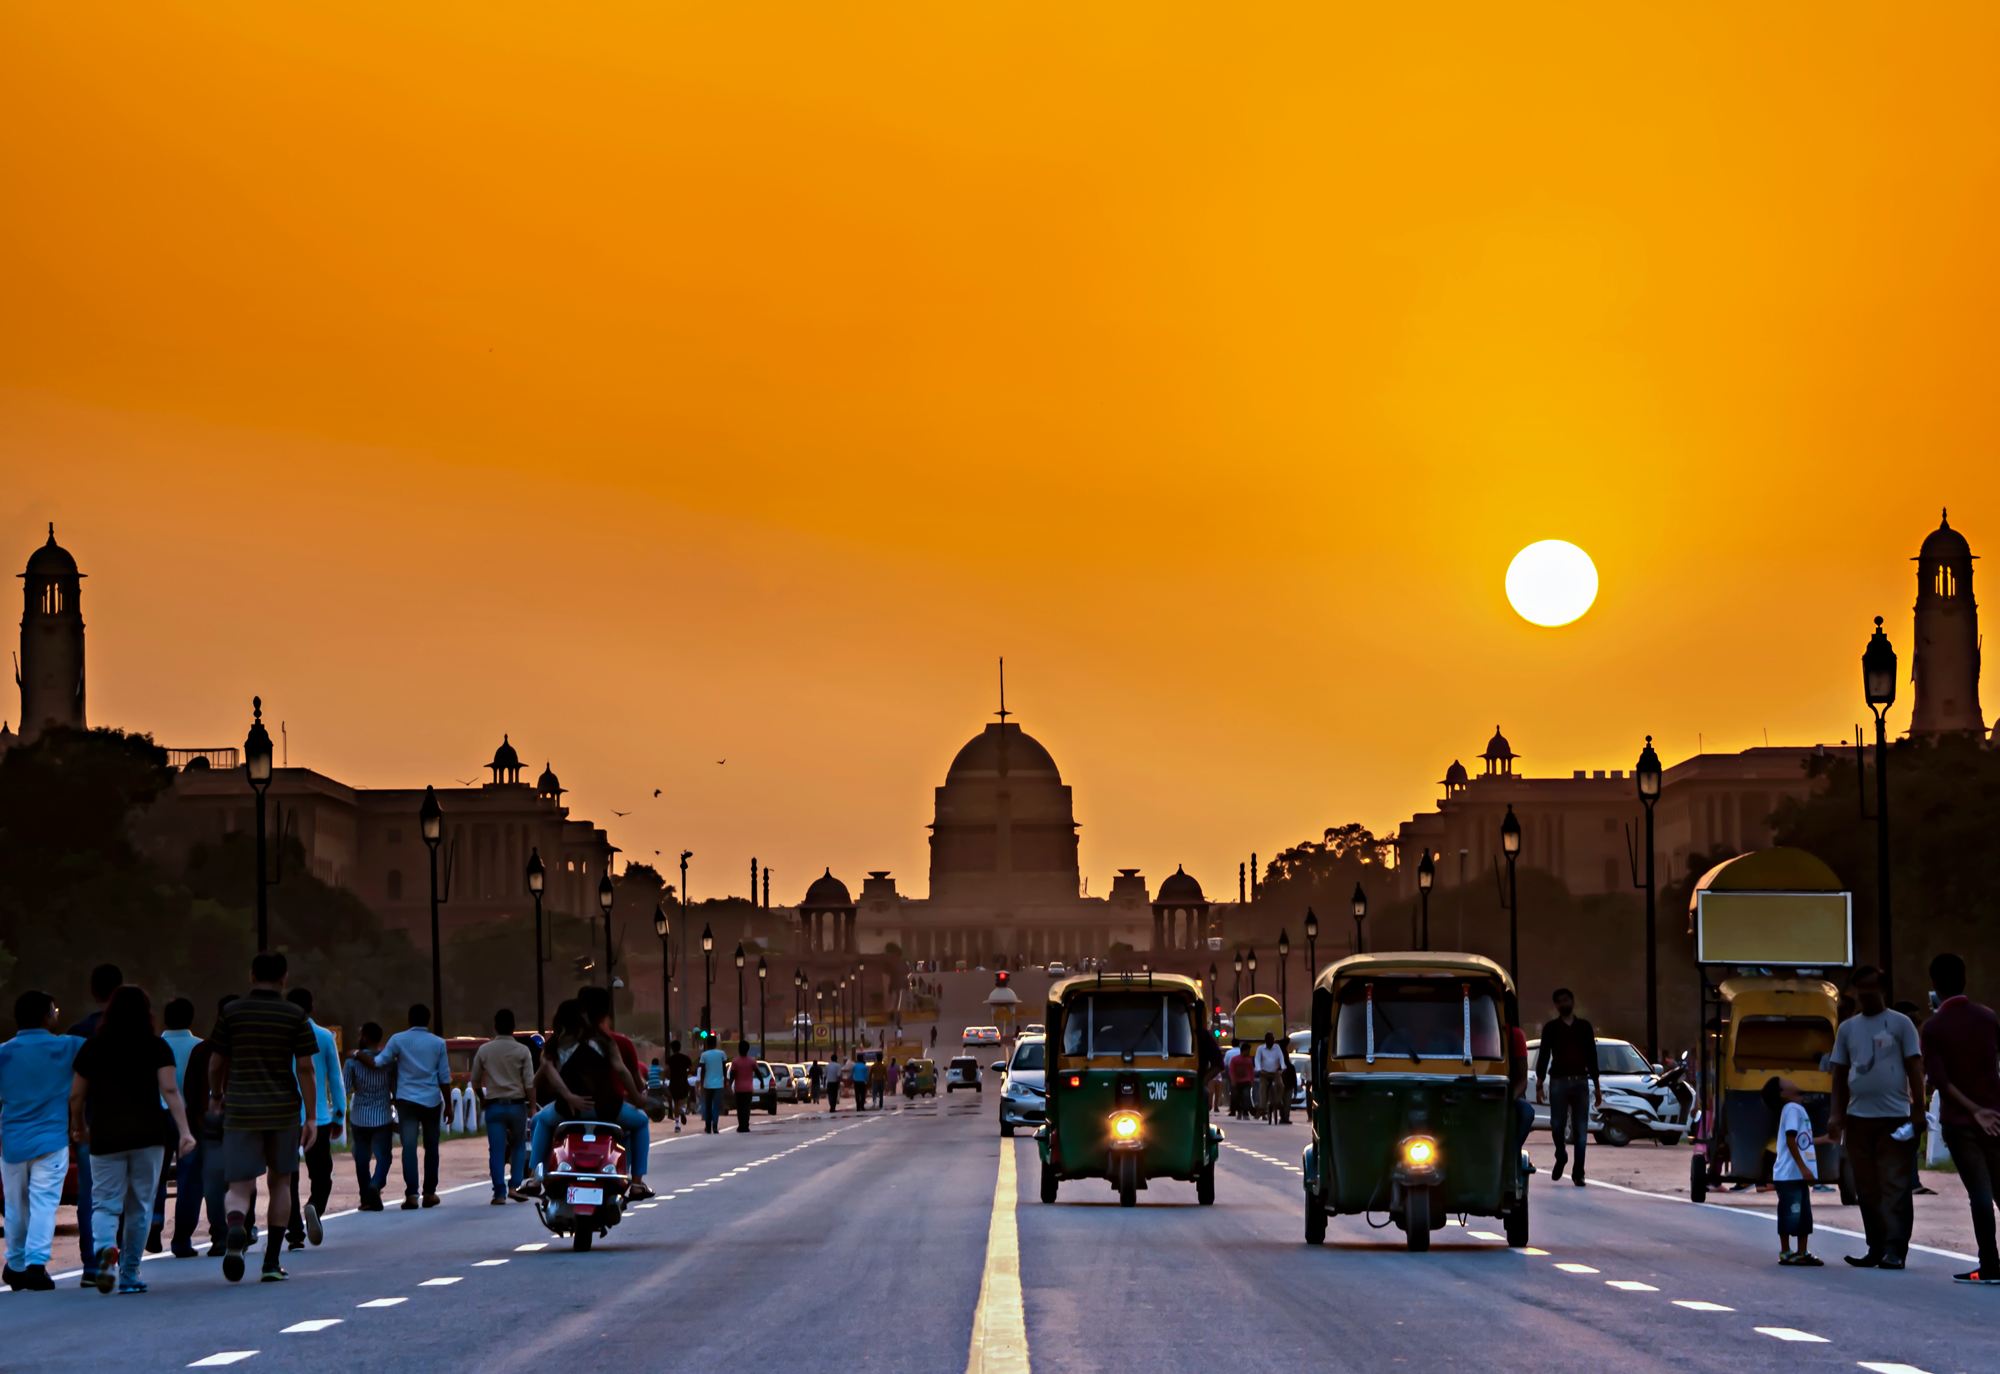 Sunset at Rashtrapati Bhavan, India